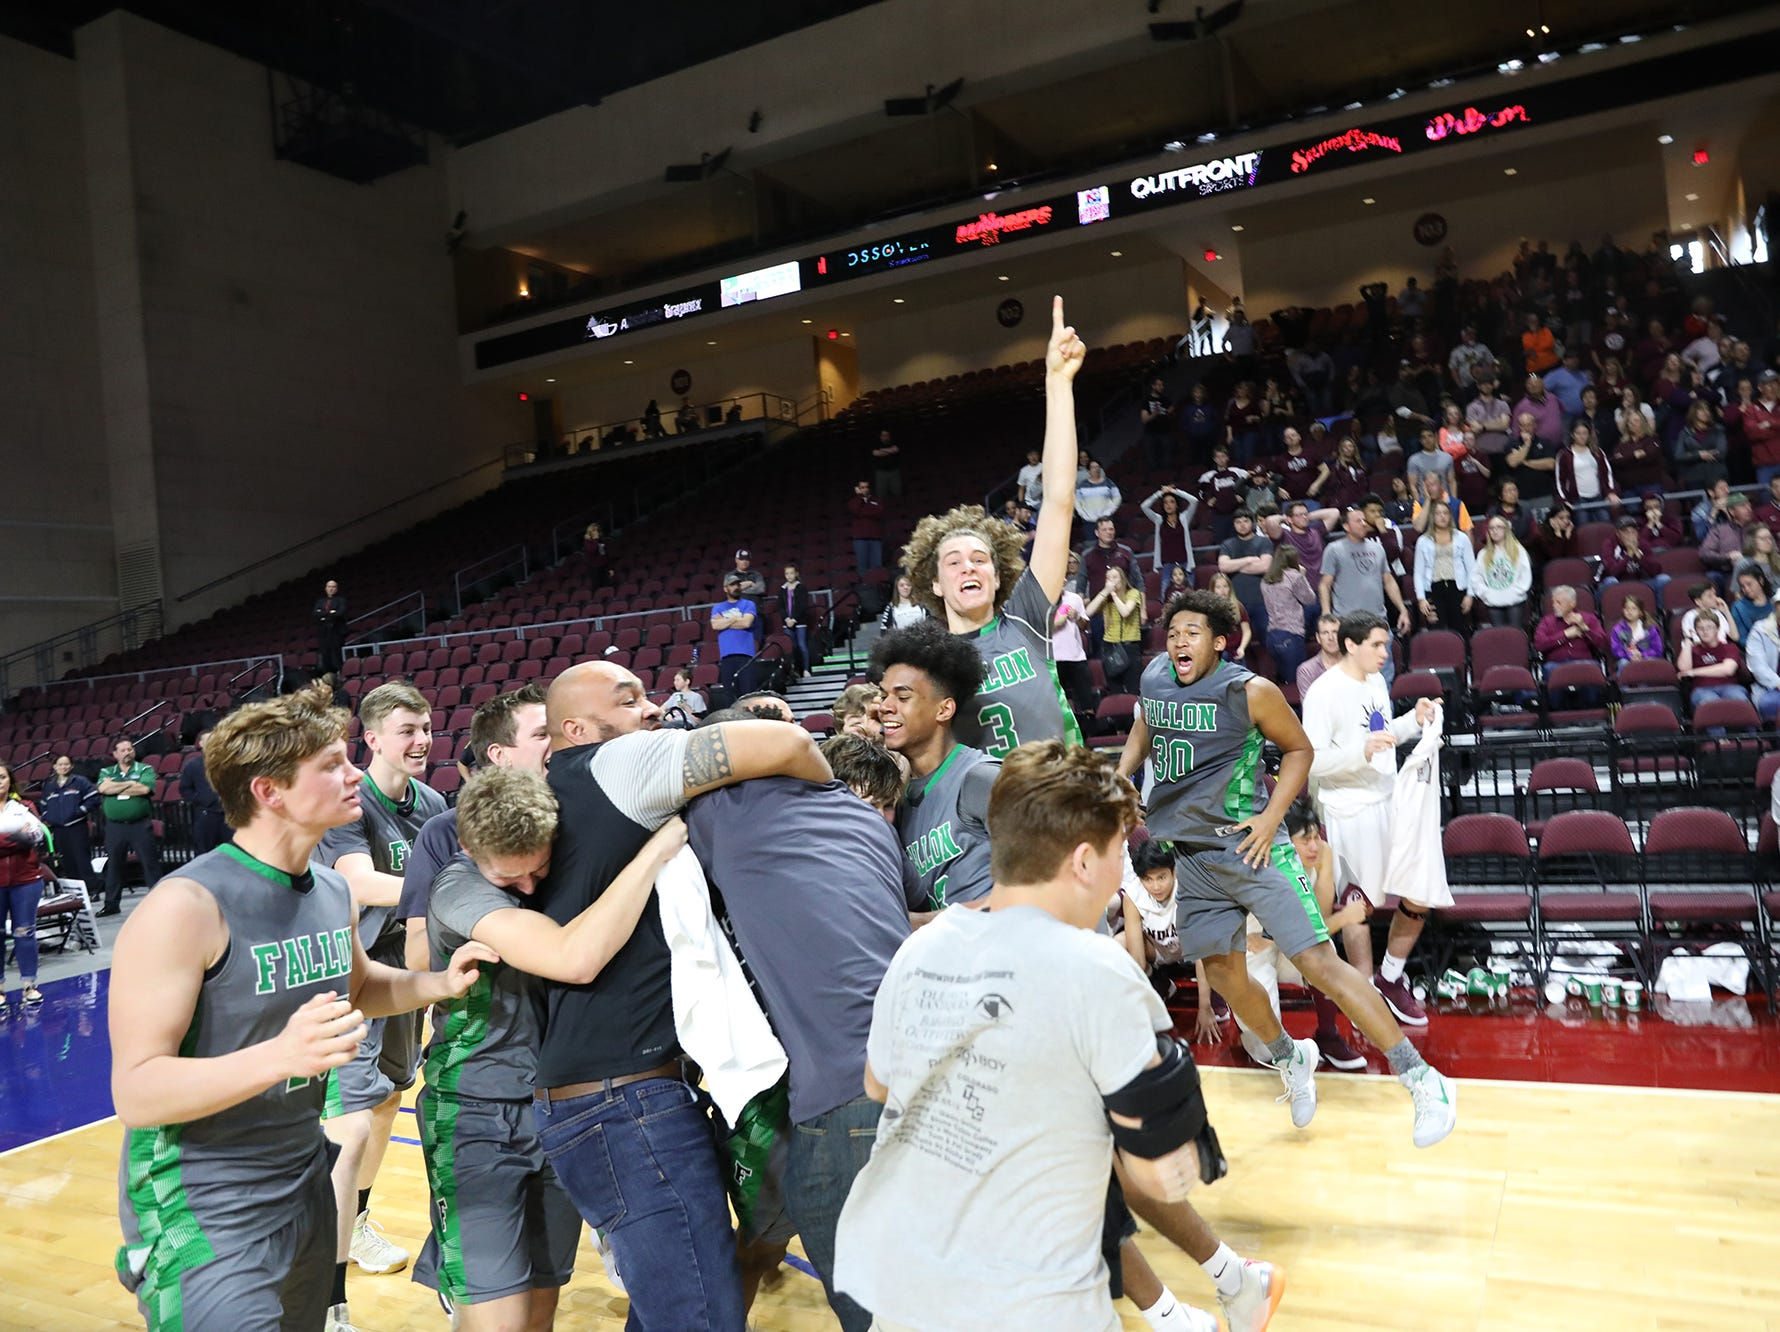 The Fallon boys won the 3A state basketball championship on Saturday.